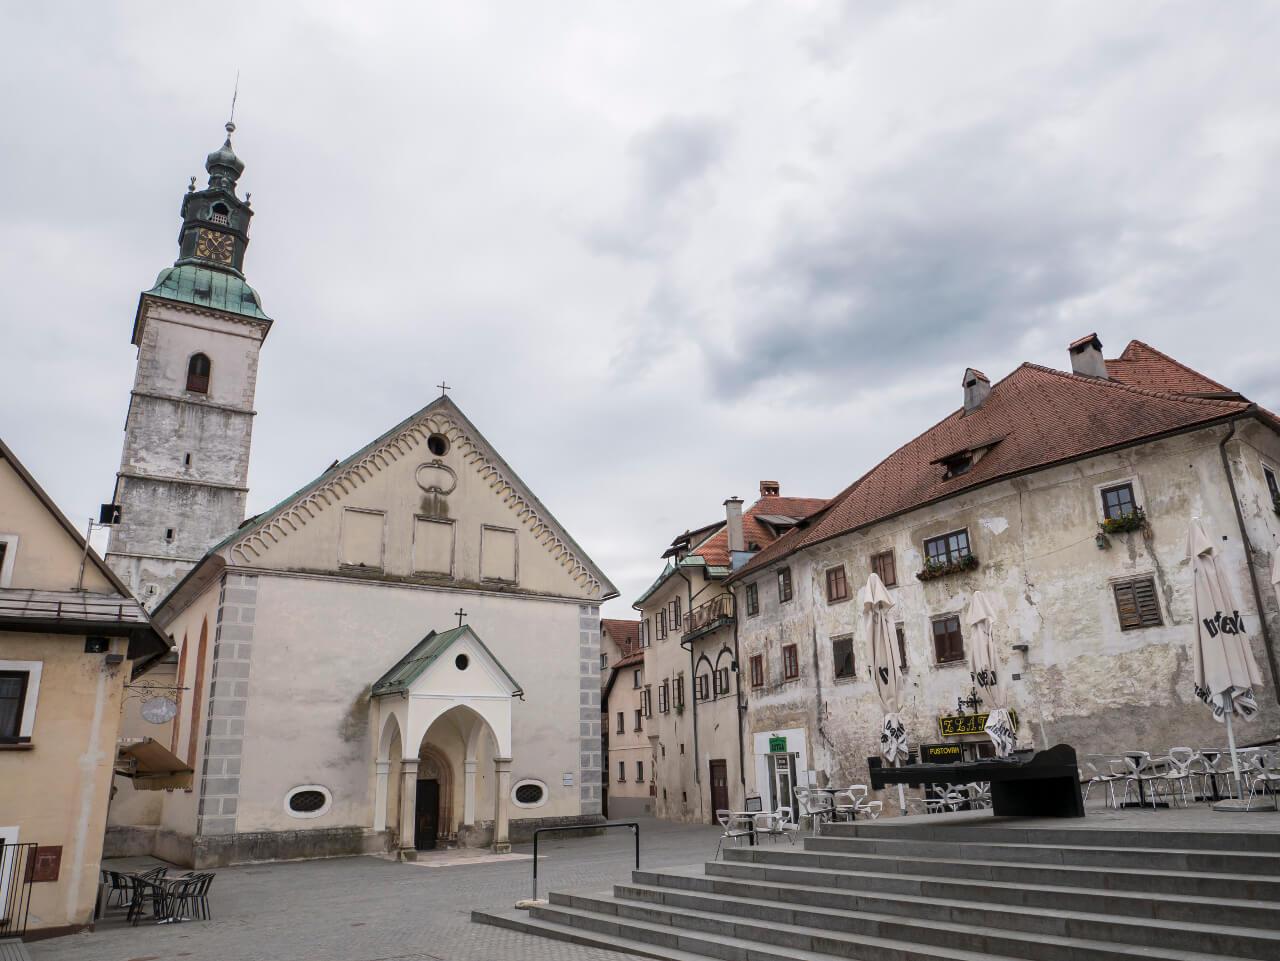 Główny plac miasta Skofja Loka - Cankarjev trg